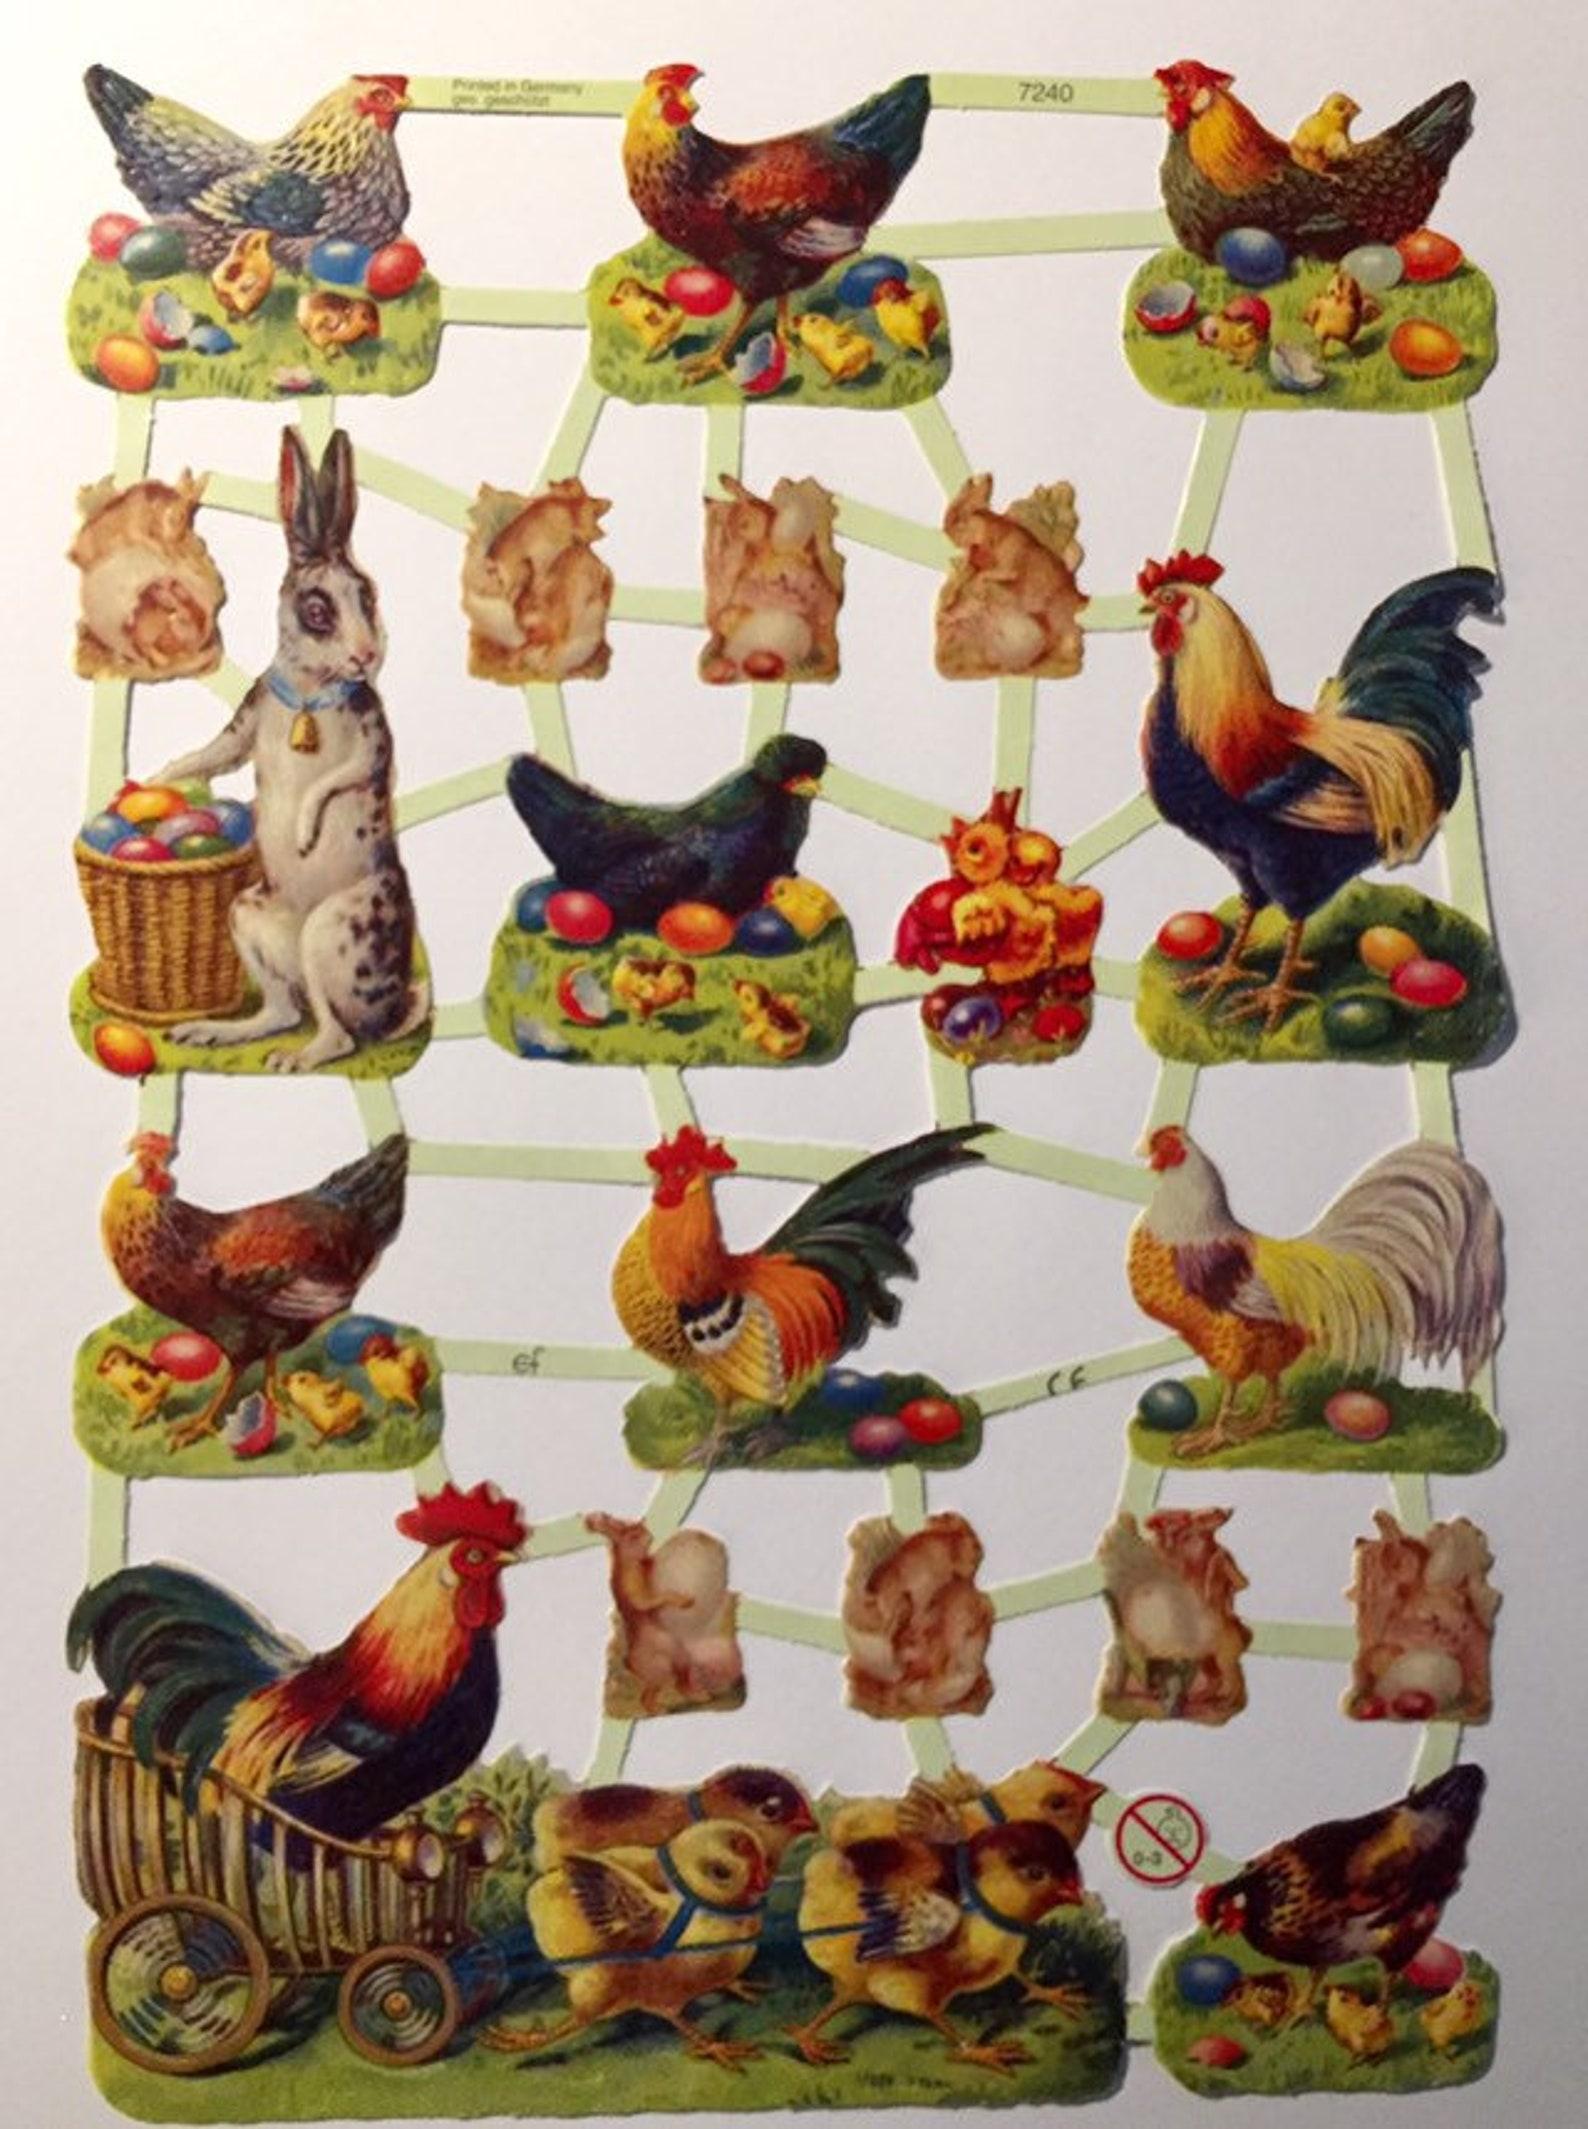 Easter Chickens Glanzbilder (1 sheet) #7240 Embossed Die Cuts - Ernst Freihoff GmbH Made in Germany